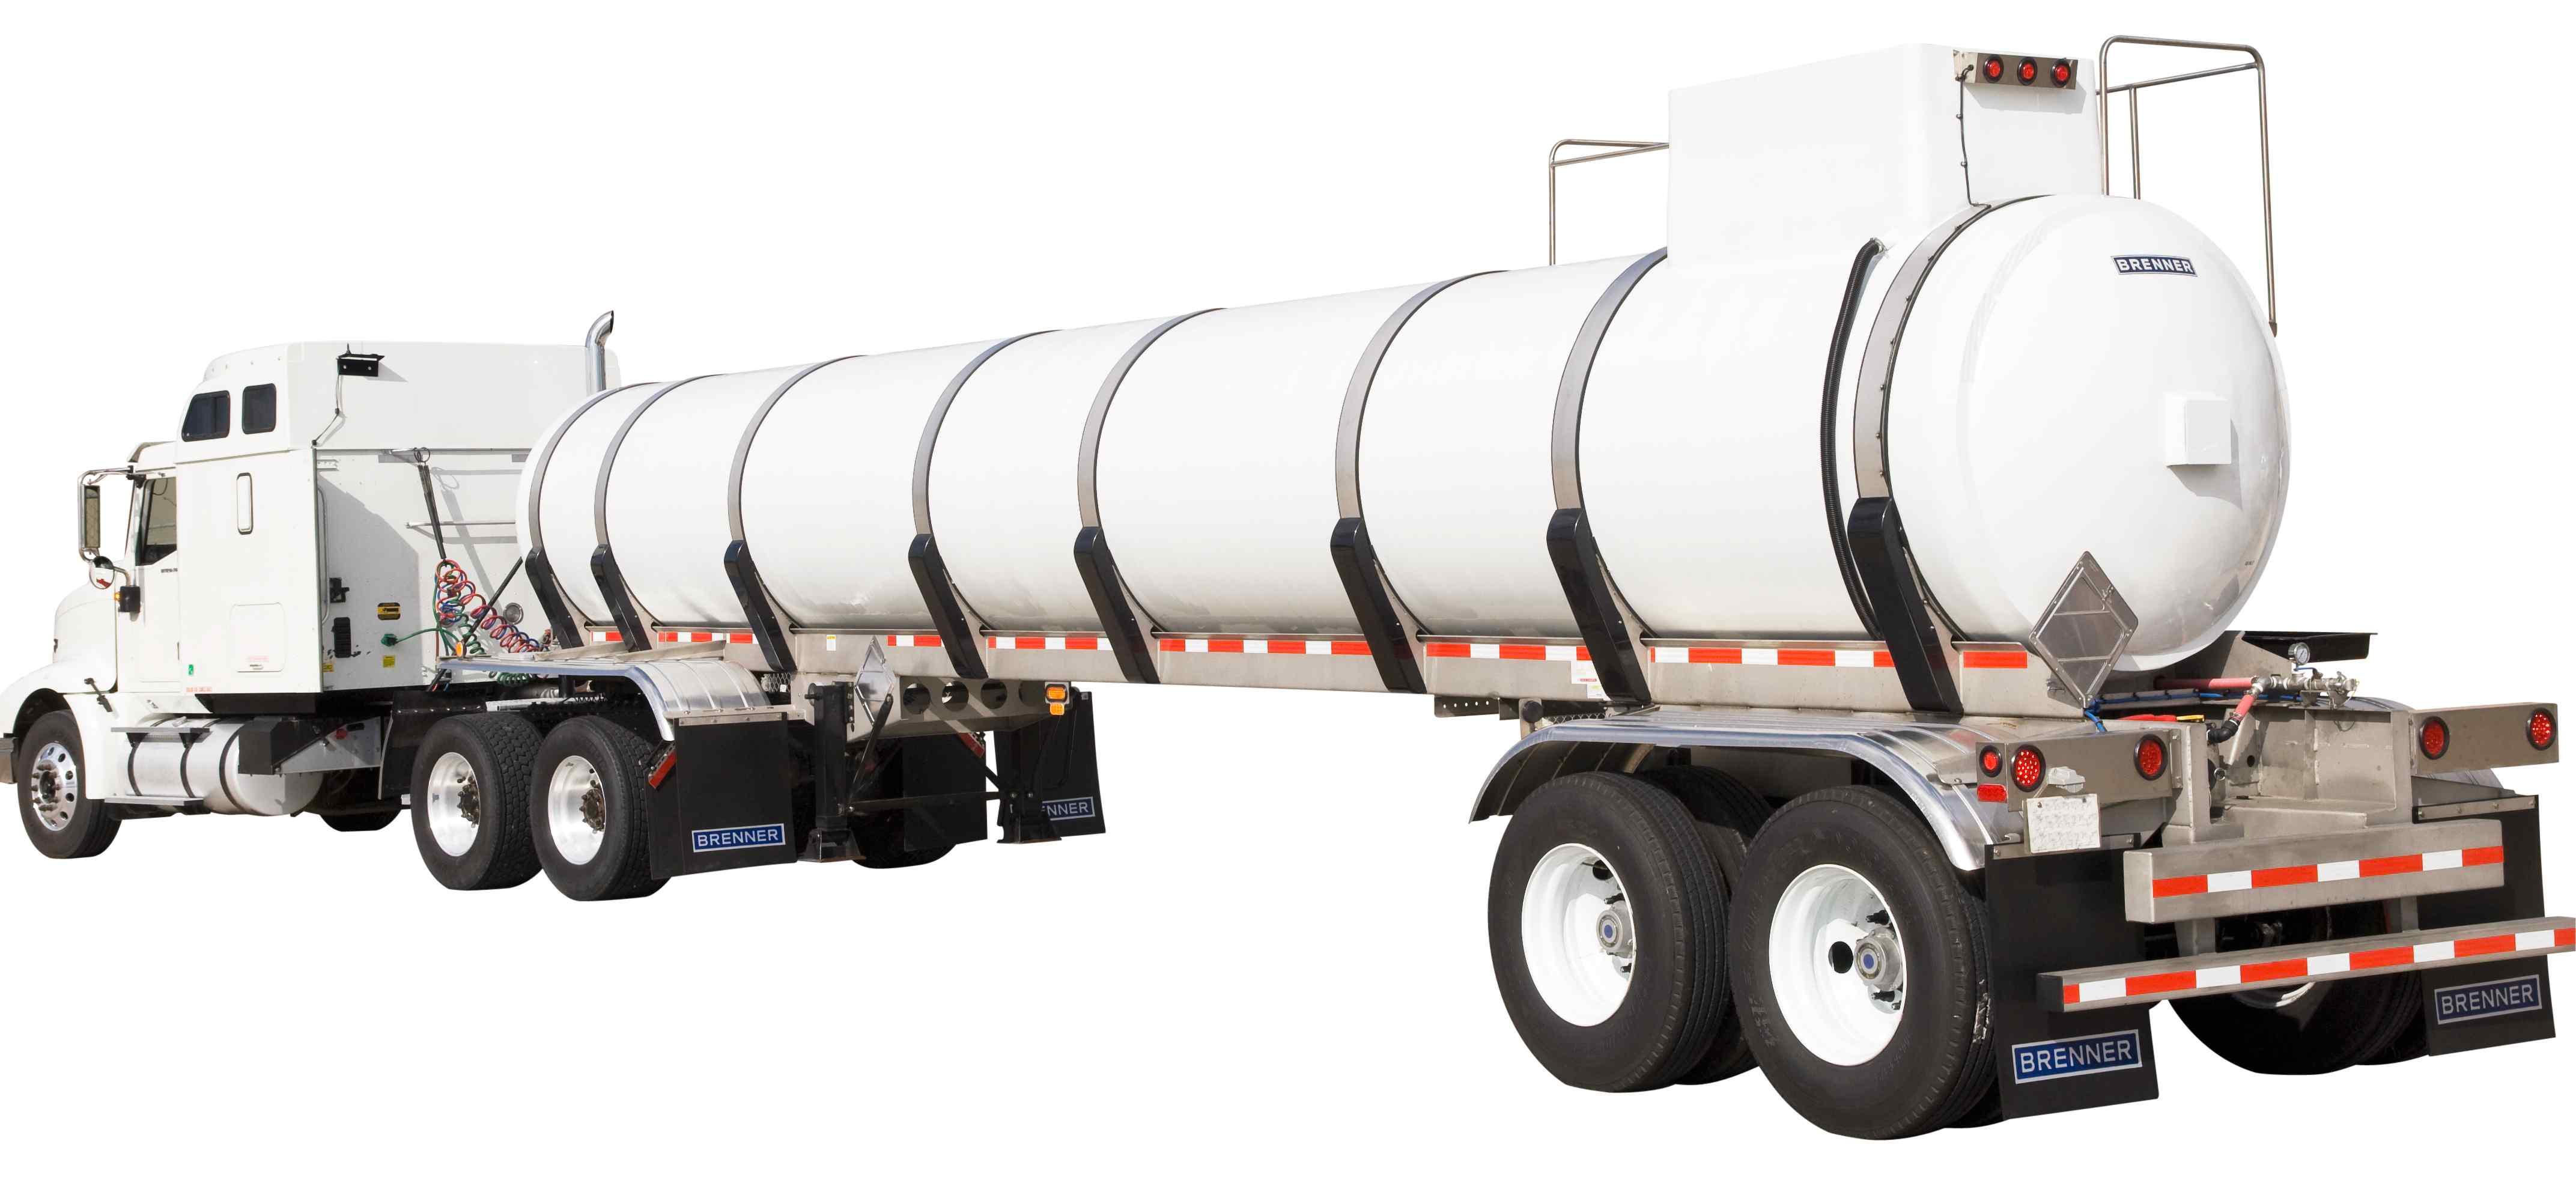 Poly Tank Trailer : Wabash national s brenner plastic tank trailer